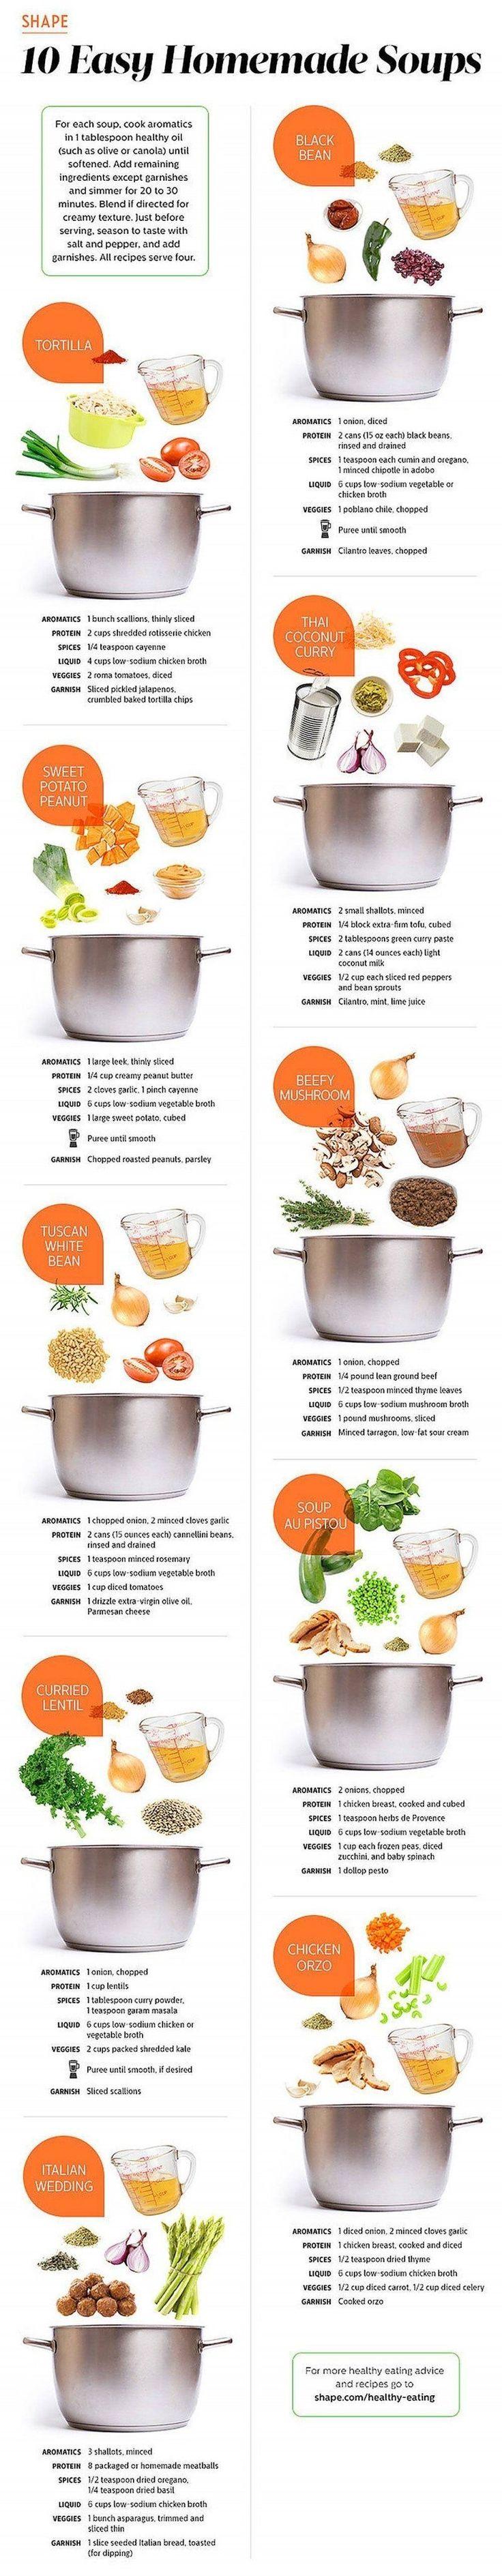 Homemade Soups